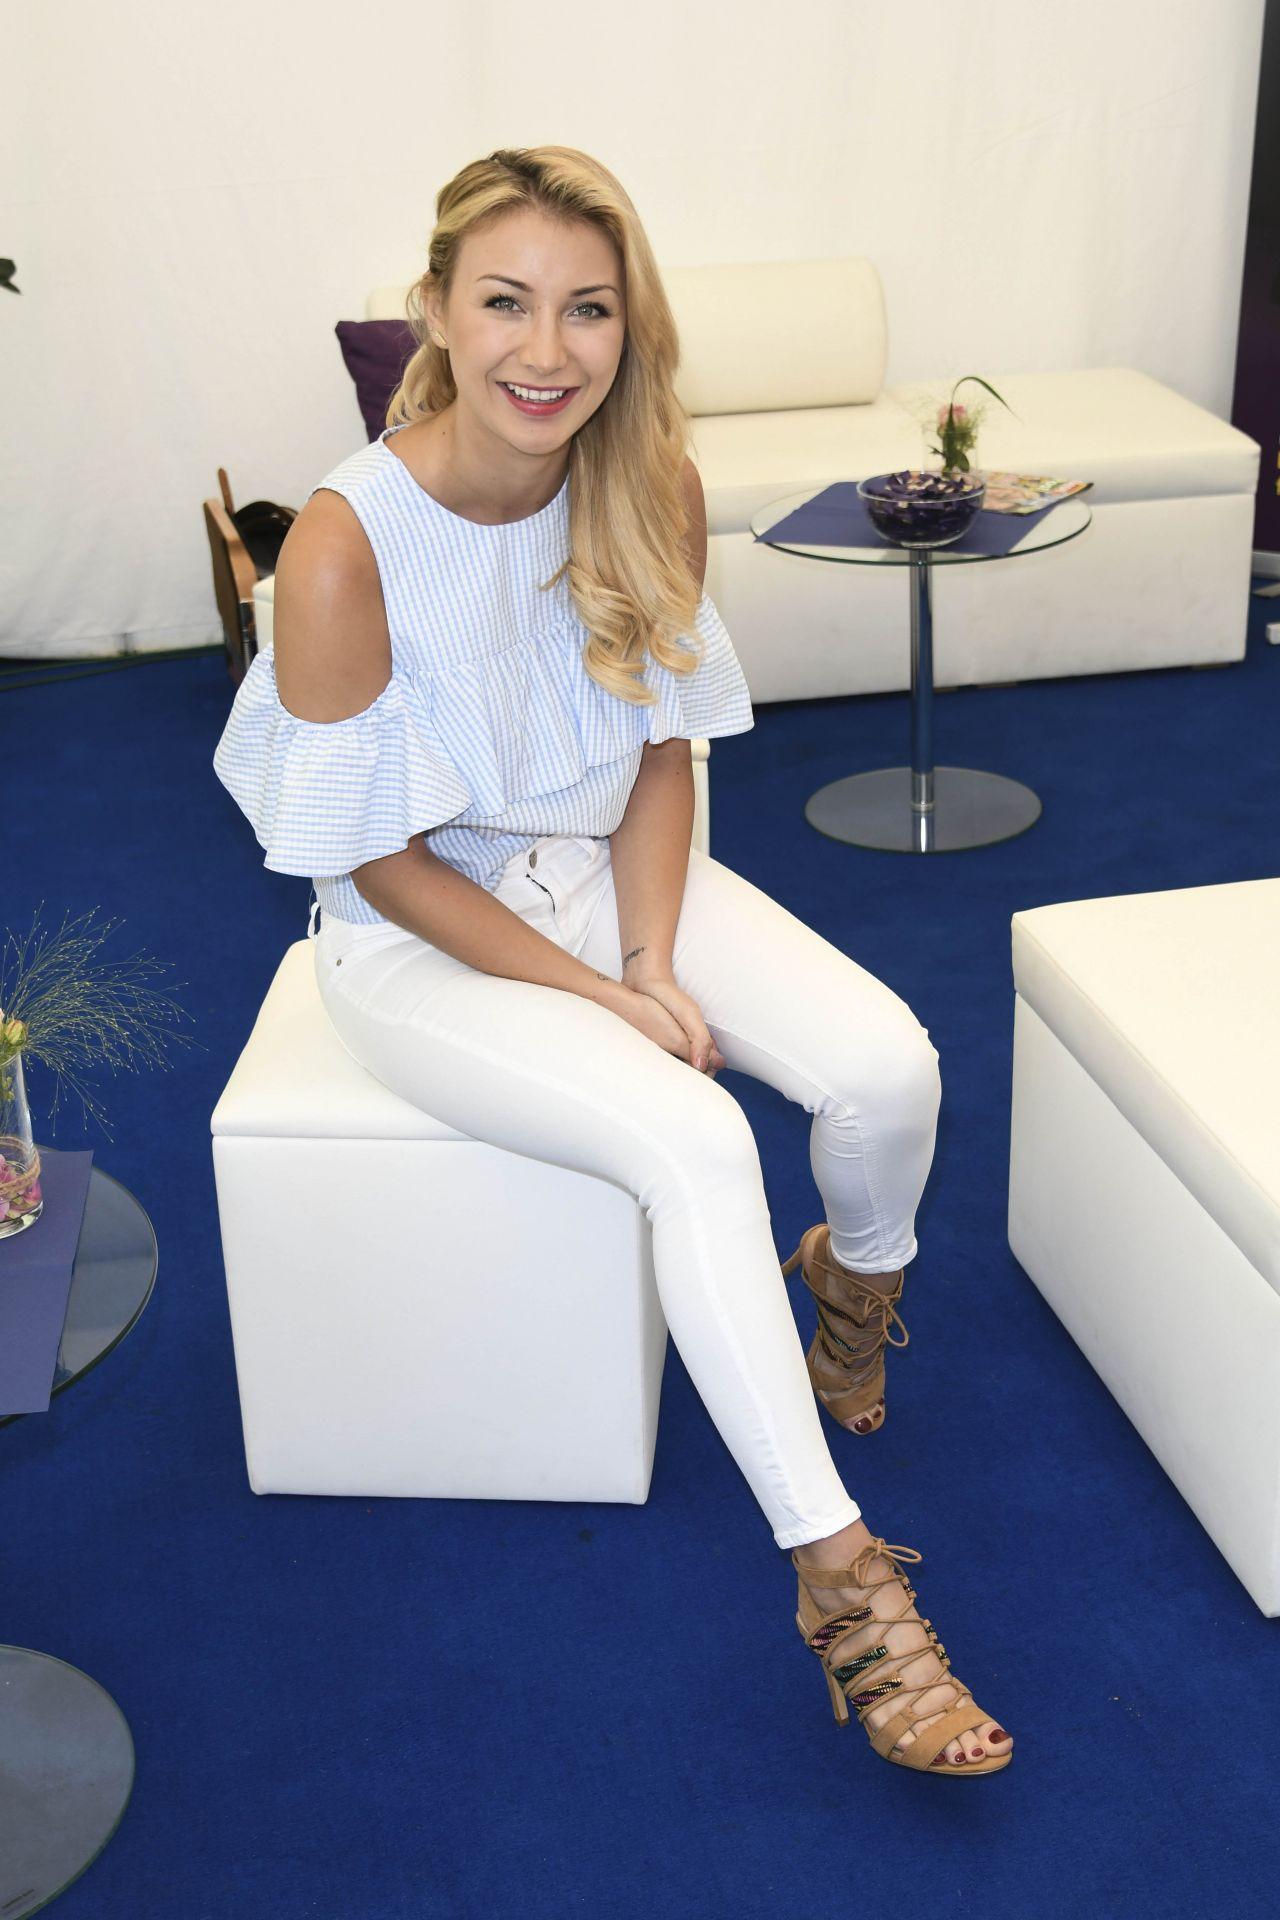 Anna-Carina Woitschack - ARD TV Show in Europapark, Rust ...